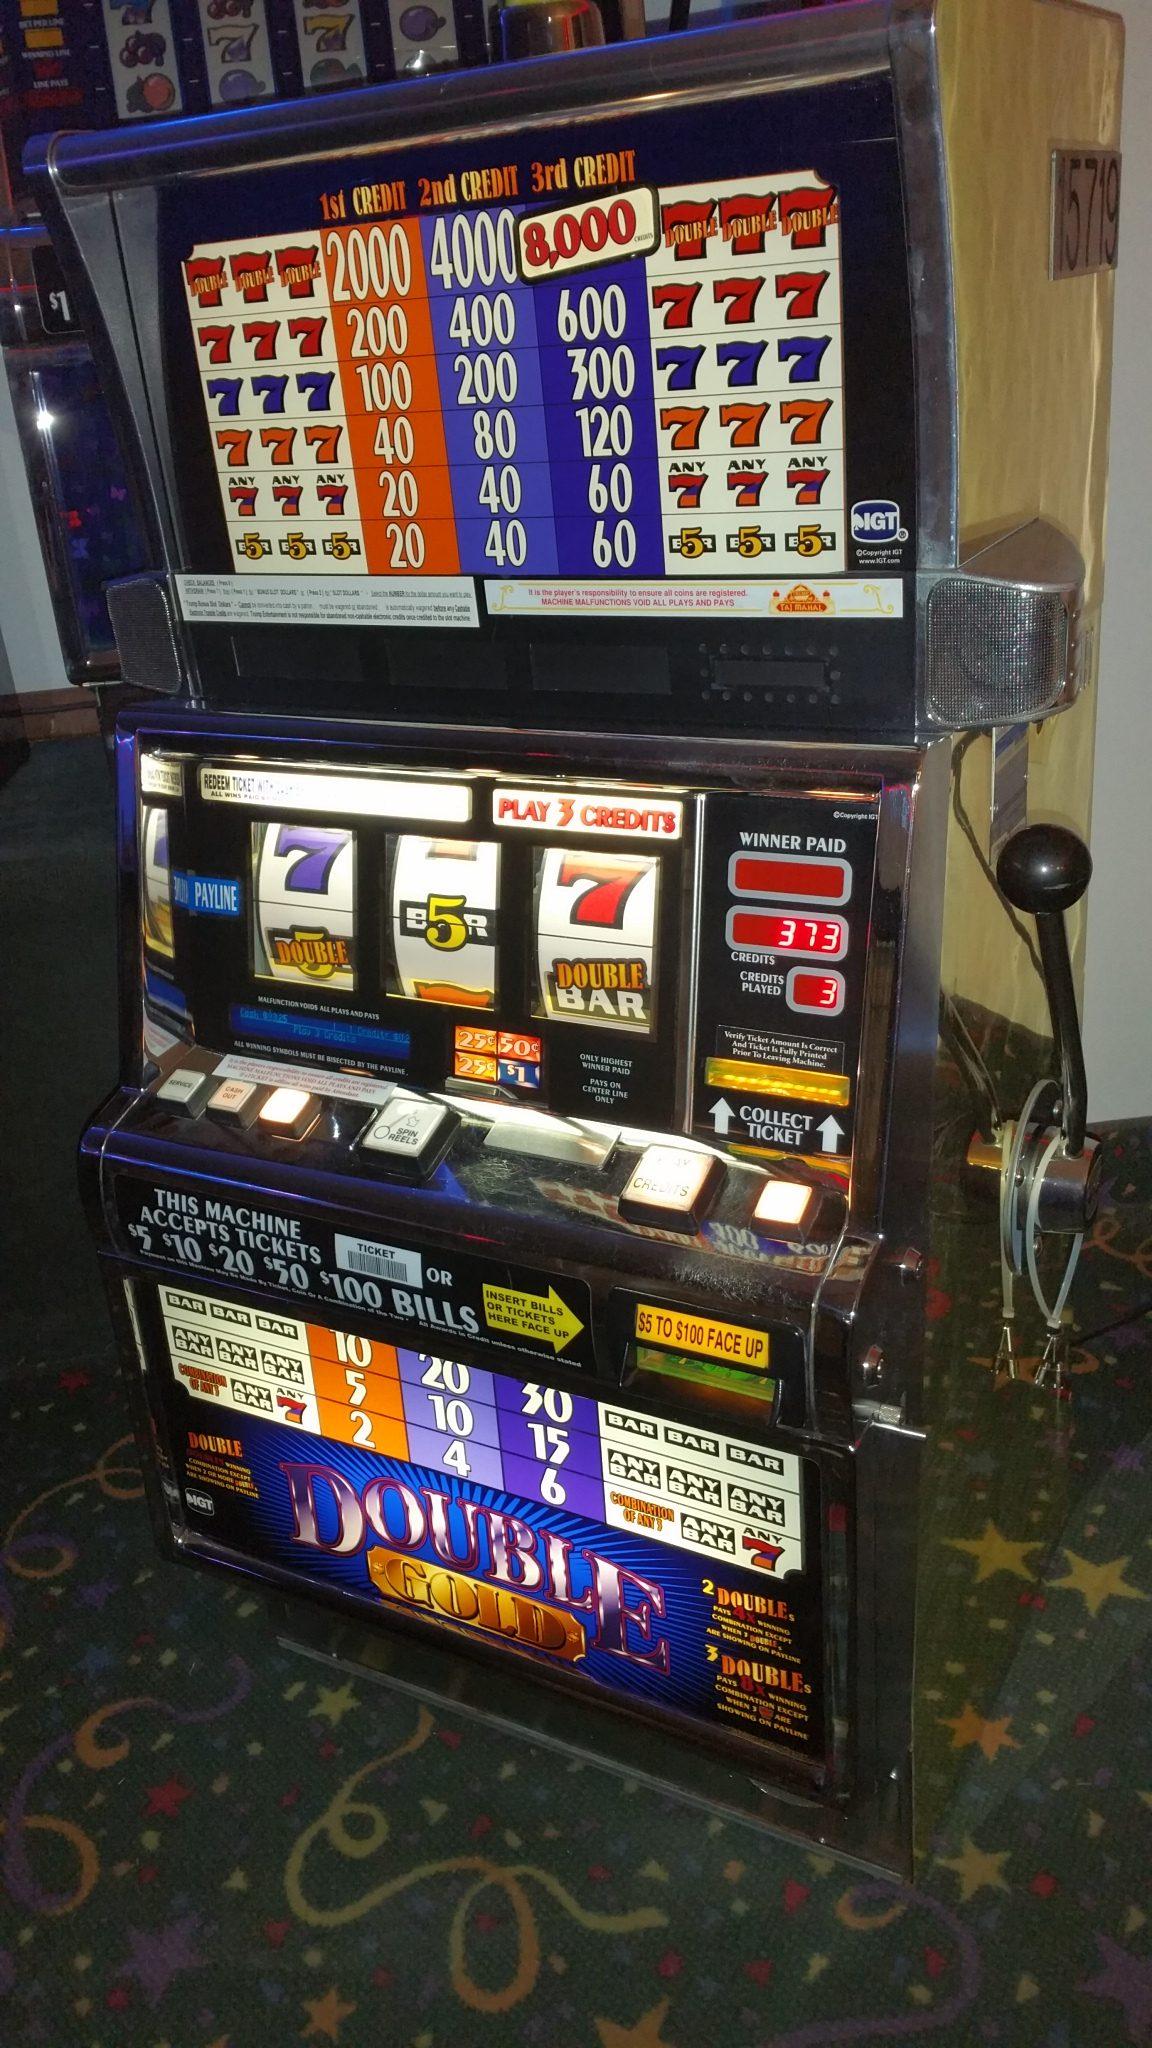 IGT S2000 Double Gold Multi-denominational Slot Machine